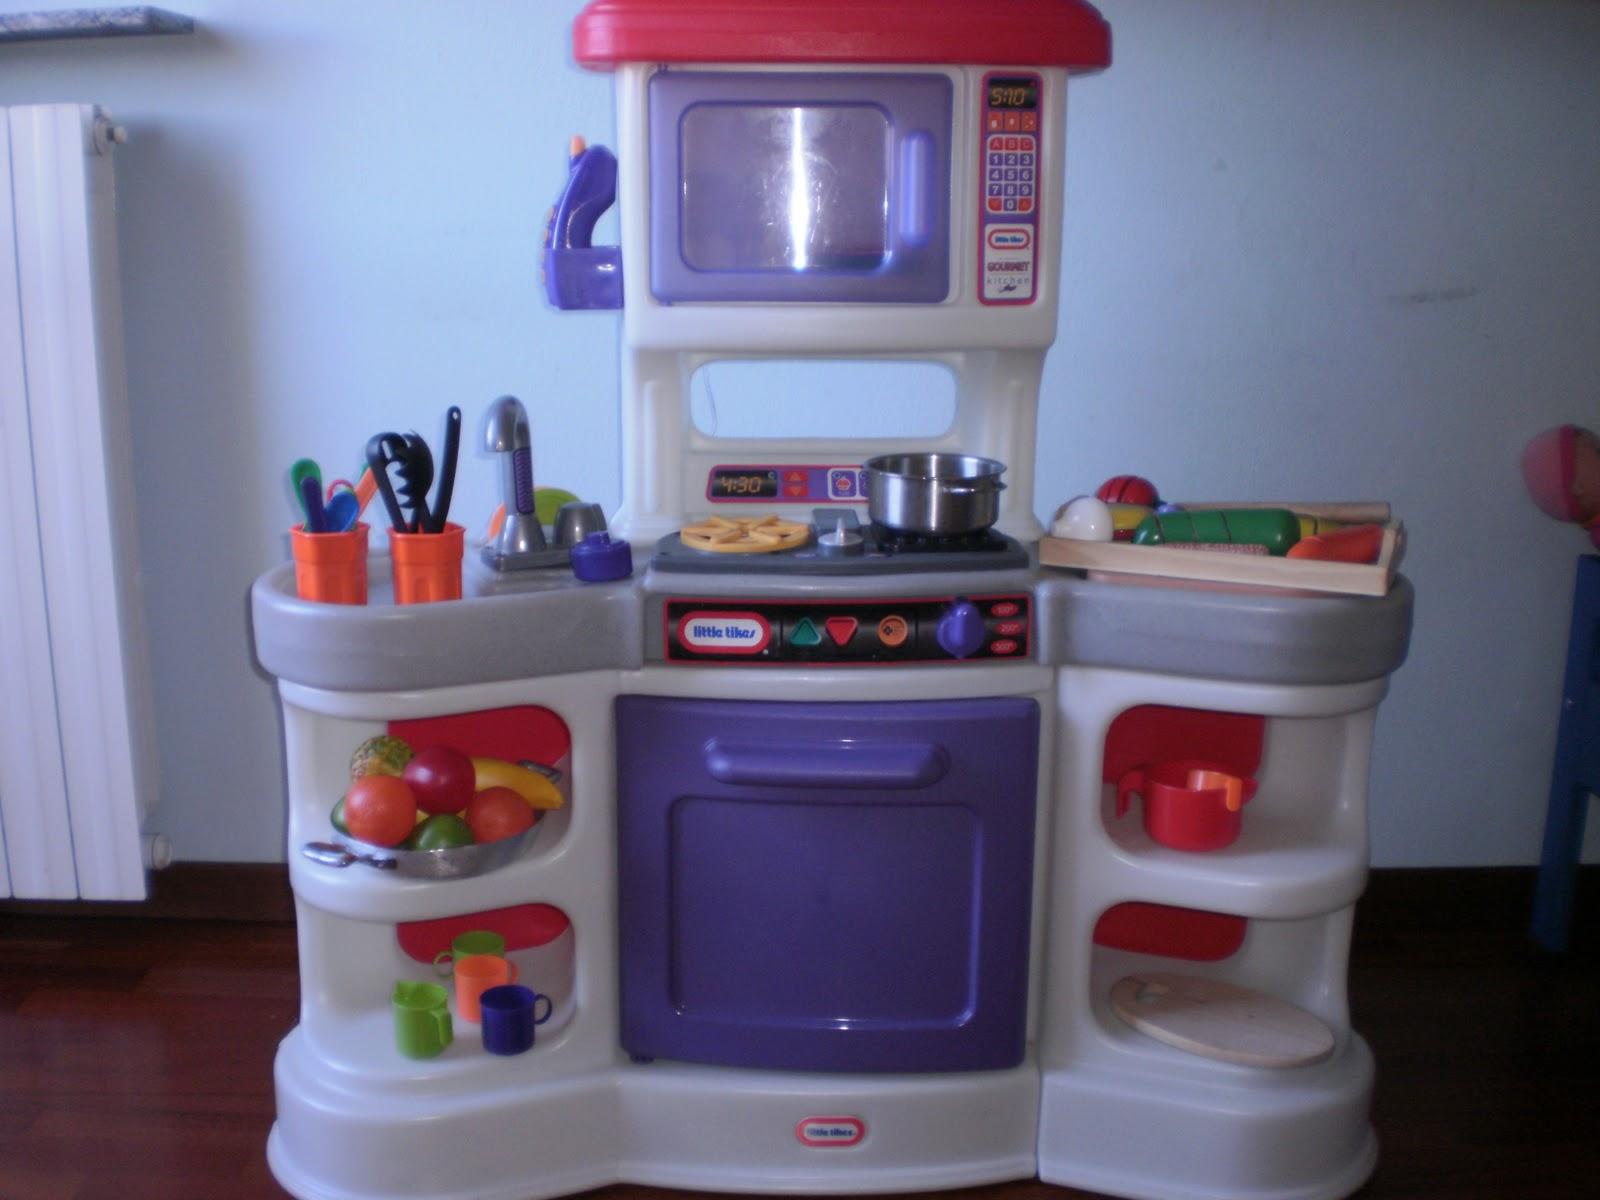 Cucine bambini ikea cucina bambini ikea usata cucina gioco ikea 77